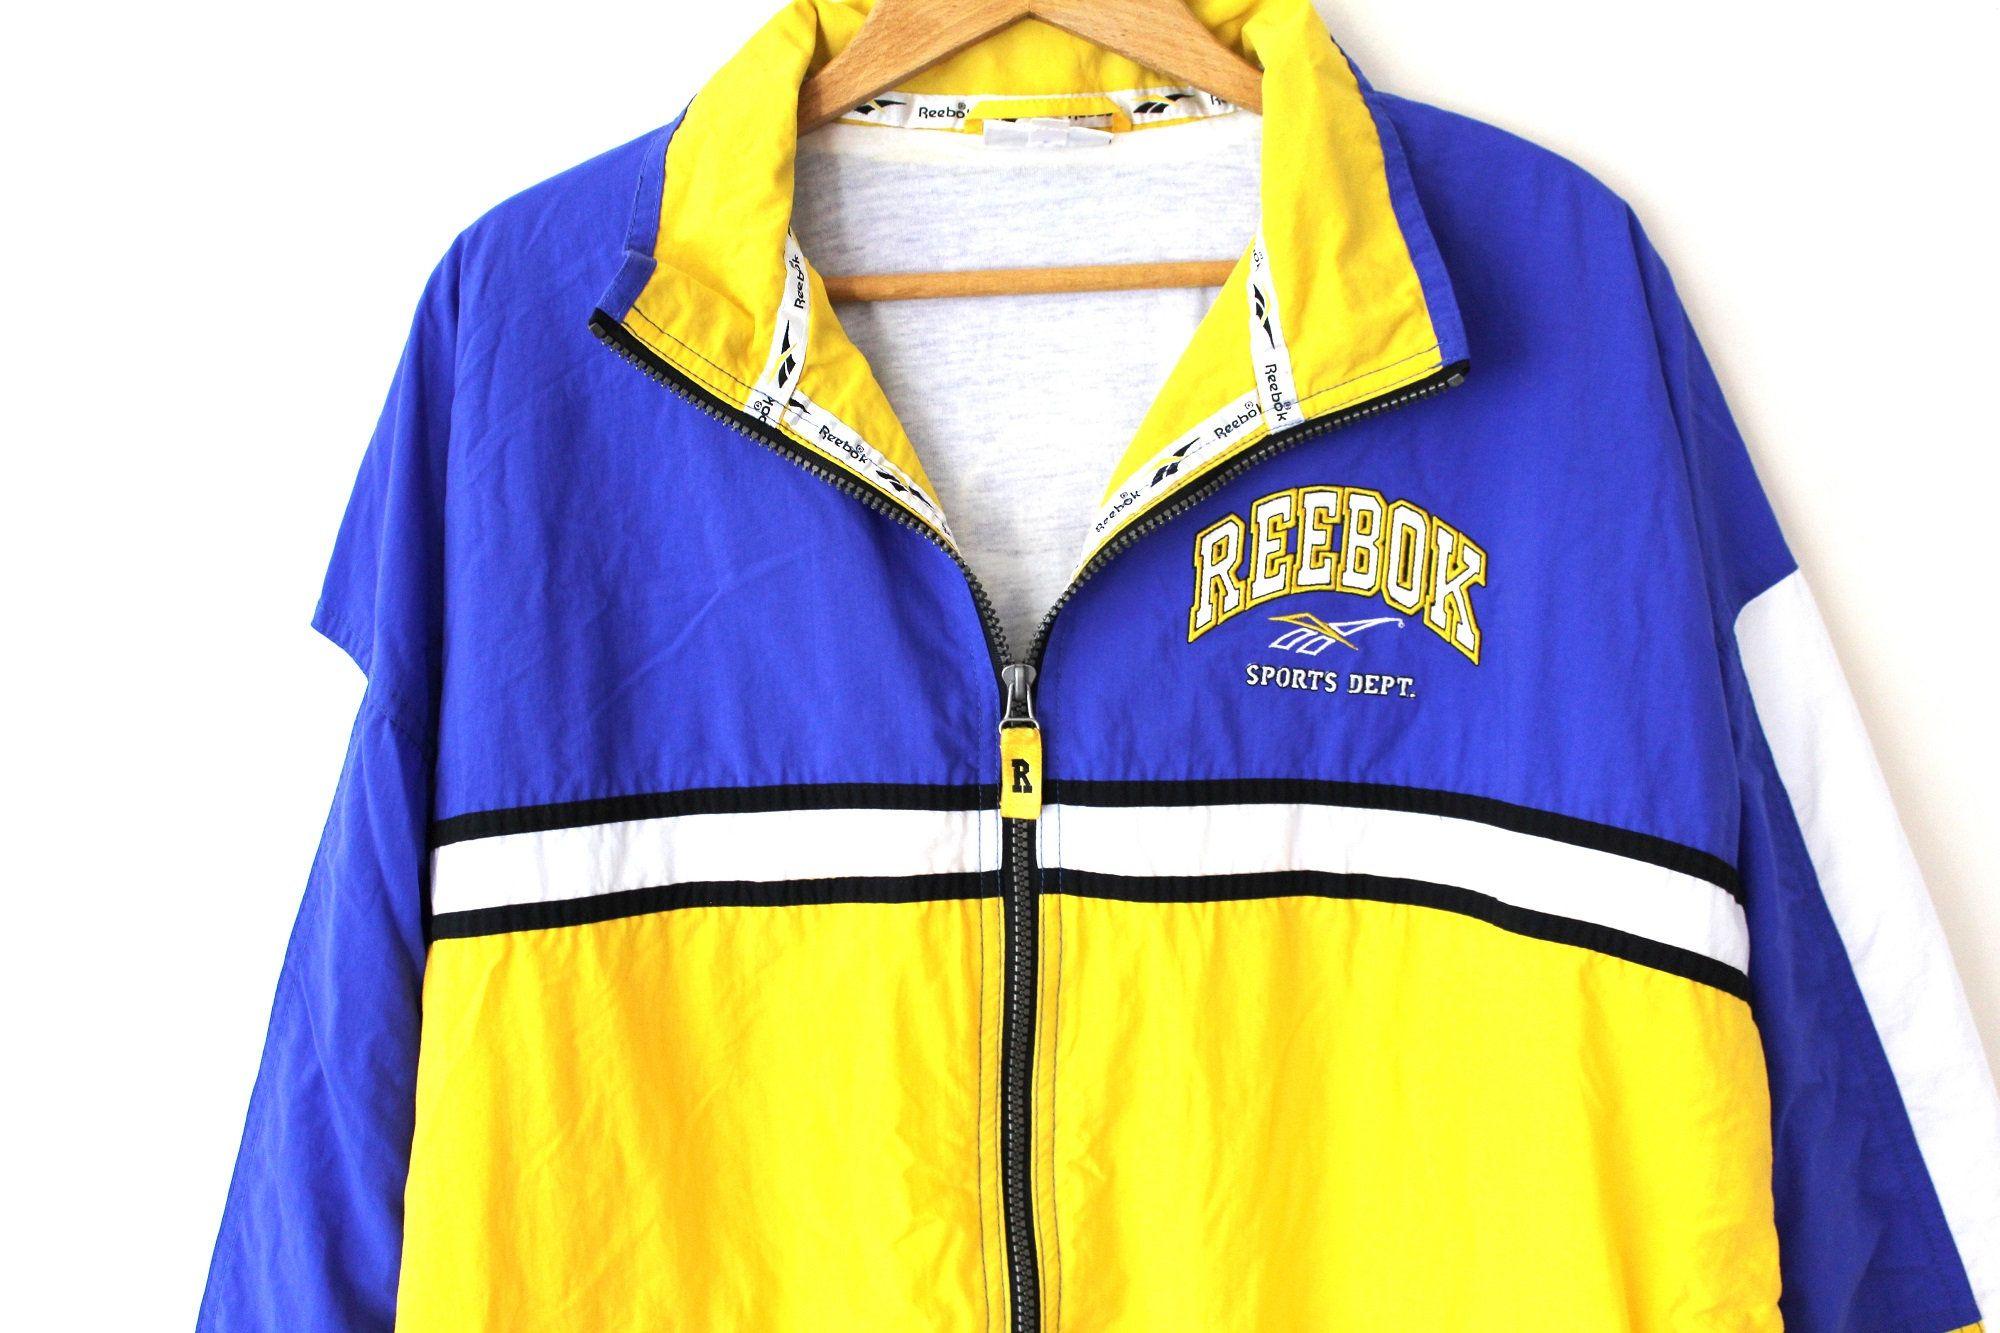 Very Rare Reebok Windbreaker Vintage Jacket Color Block Tracksuit Retro Yellow Blue White Zipped Sweatshirt Hip Hop Size Xl Vintage Jacket Windbreaker Jackets [ 1333 x 2000 Pixel ]